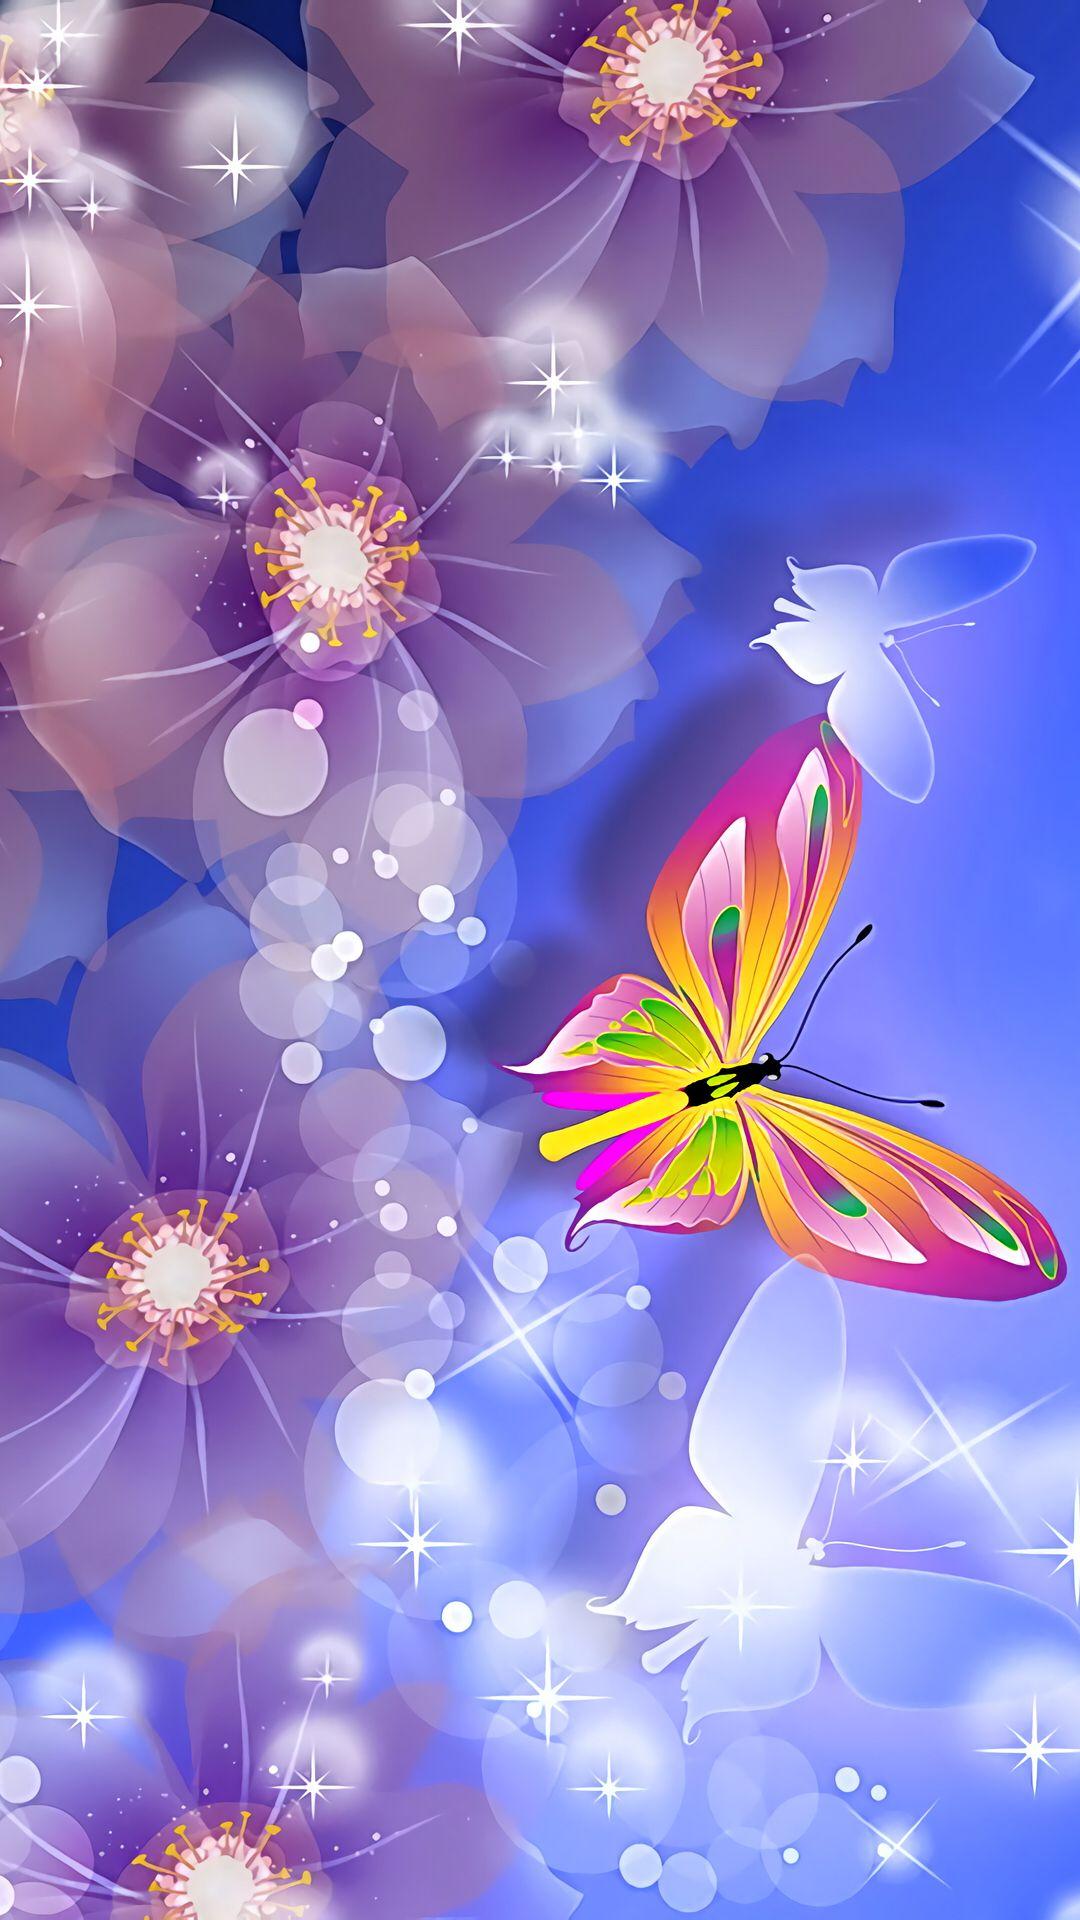 Floral Glow Flower iphone wallpaper, Butterfly wallpaper